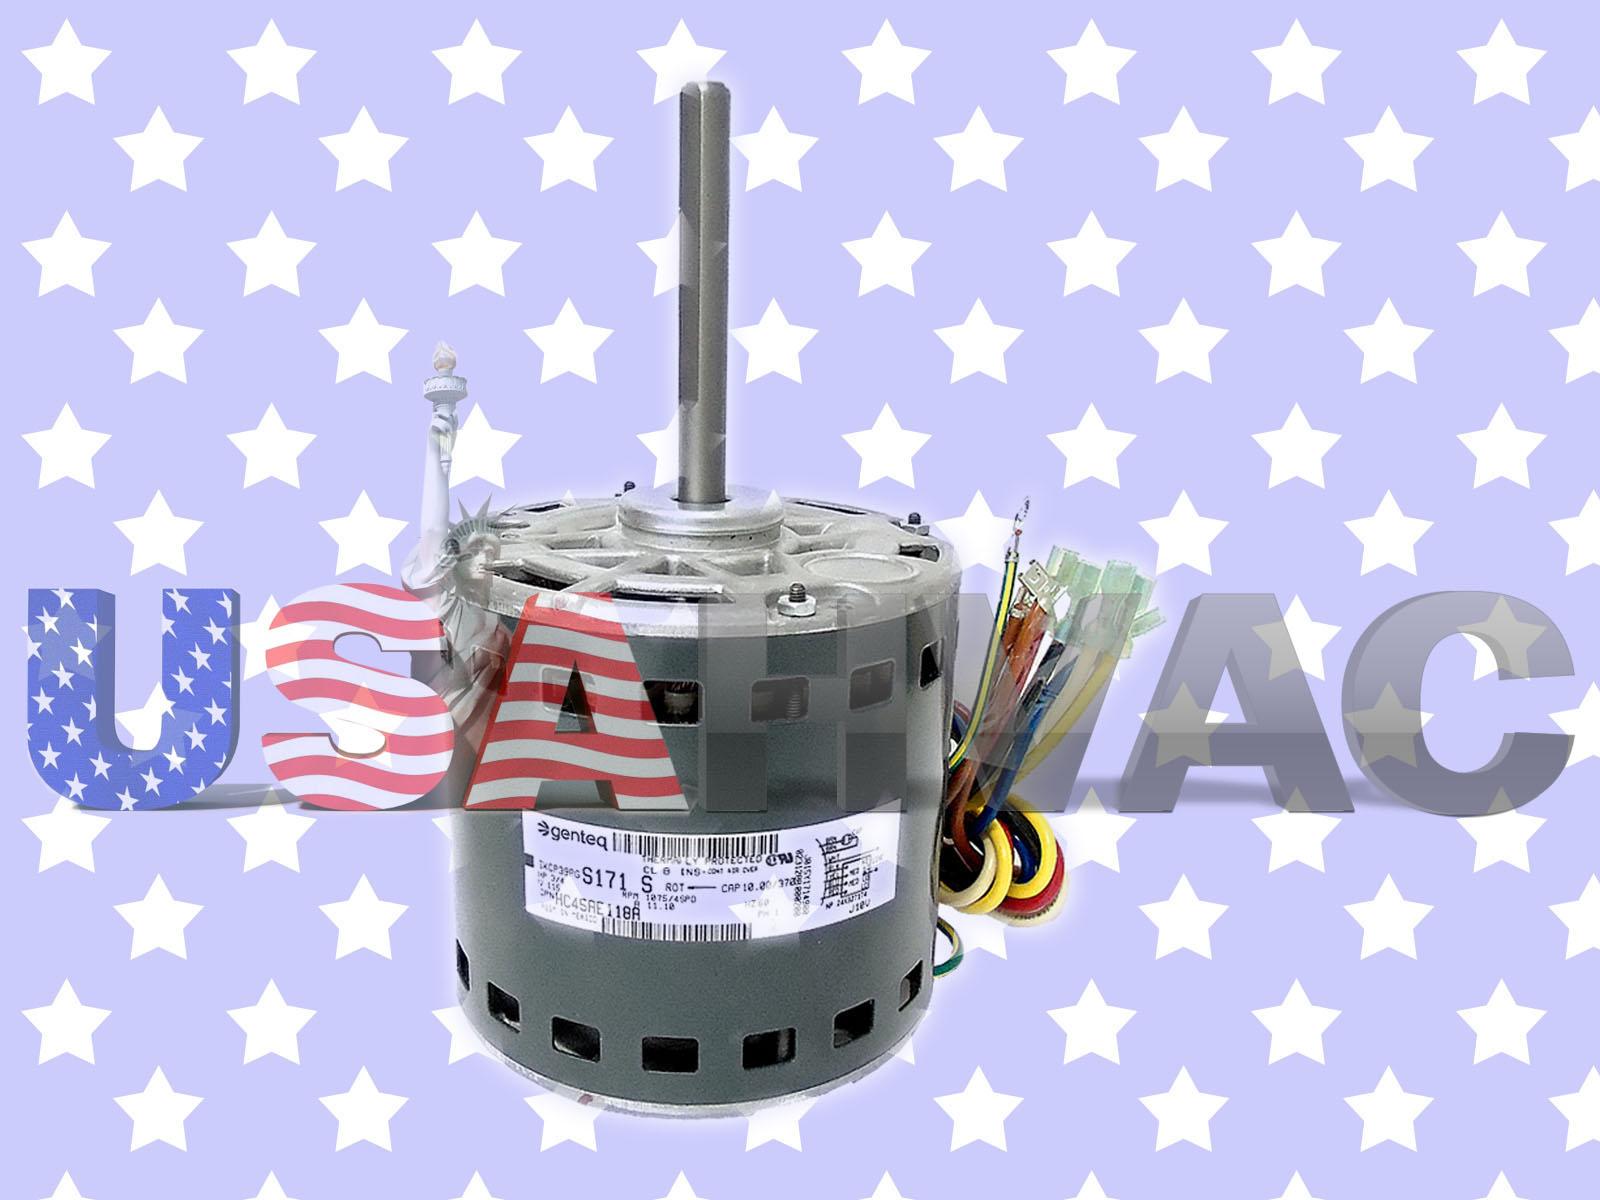 Ac motor bad capacitor 28 images ac capacitor for Bad blower motor symptoms in hvac